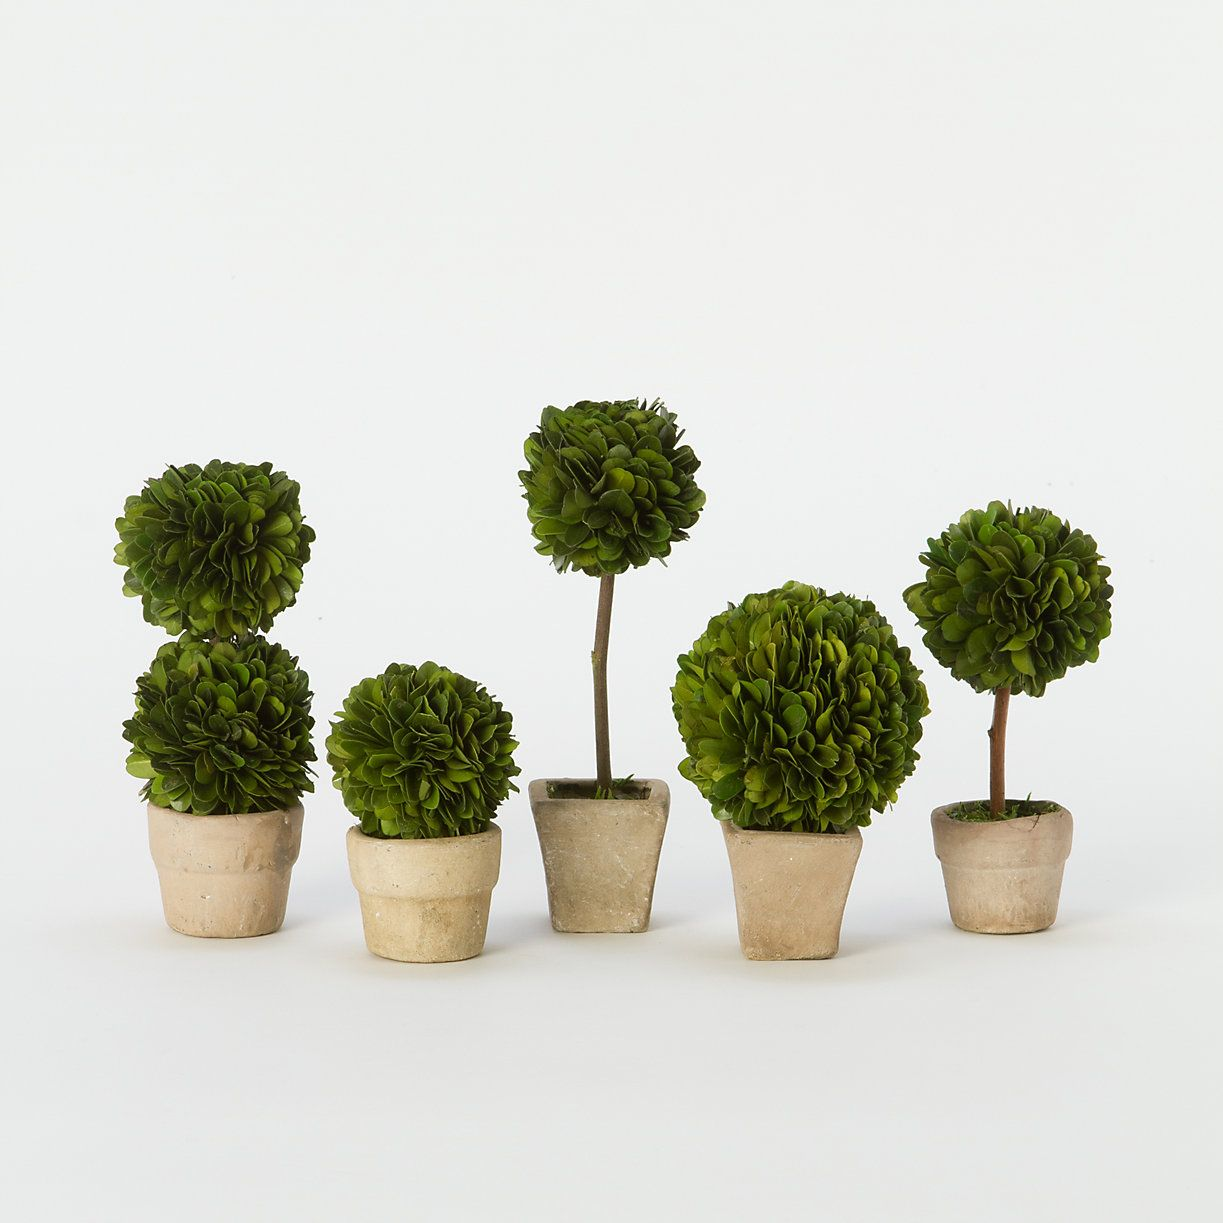 Preserved Boxwood Mini Topiary Set Preserved Boxwood Topiary Preserved Boxwood Topiary